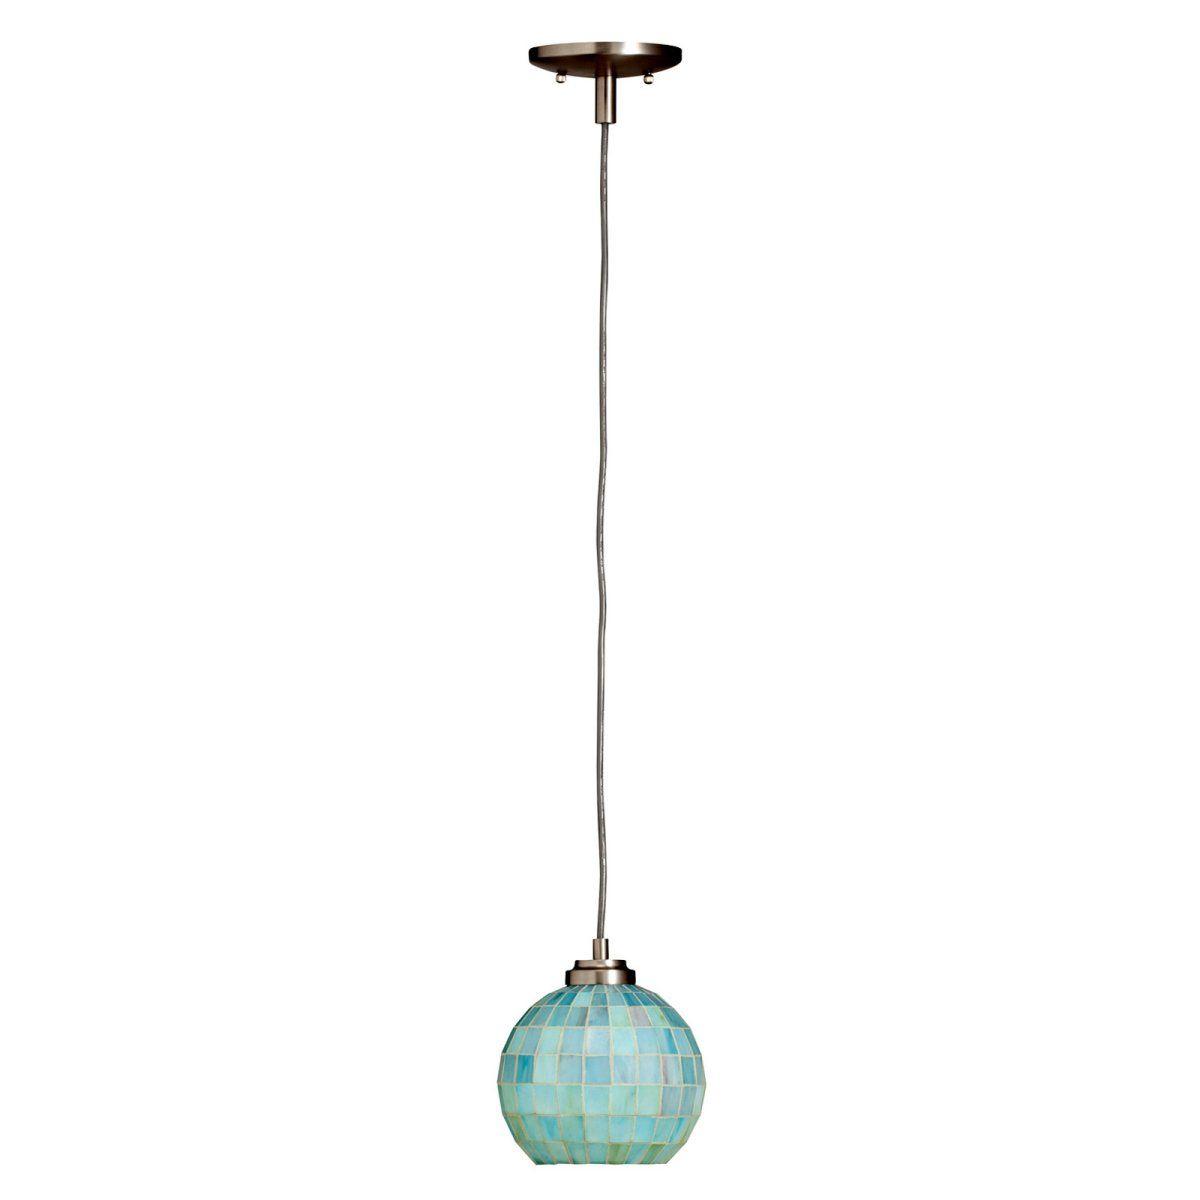 Kichler 65336 Casita Tiffany 1-Light Mini Pendant